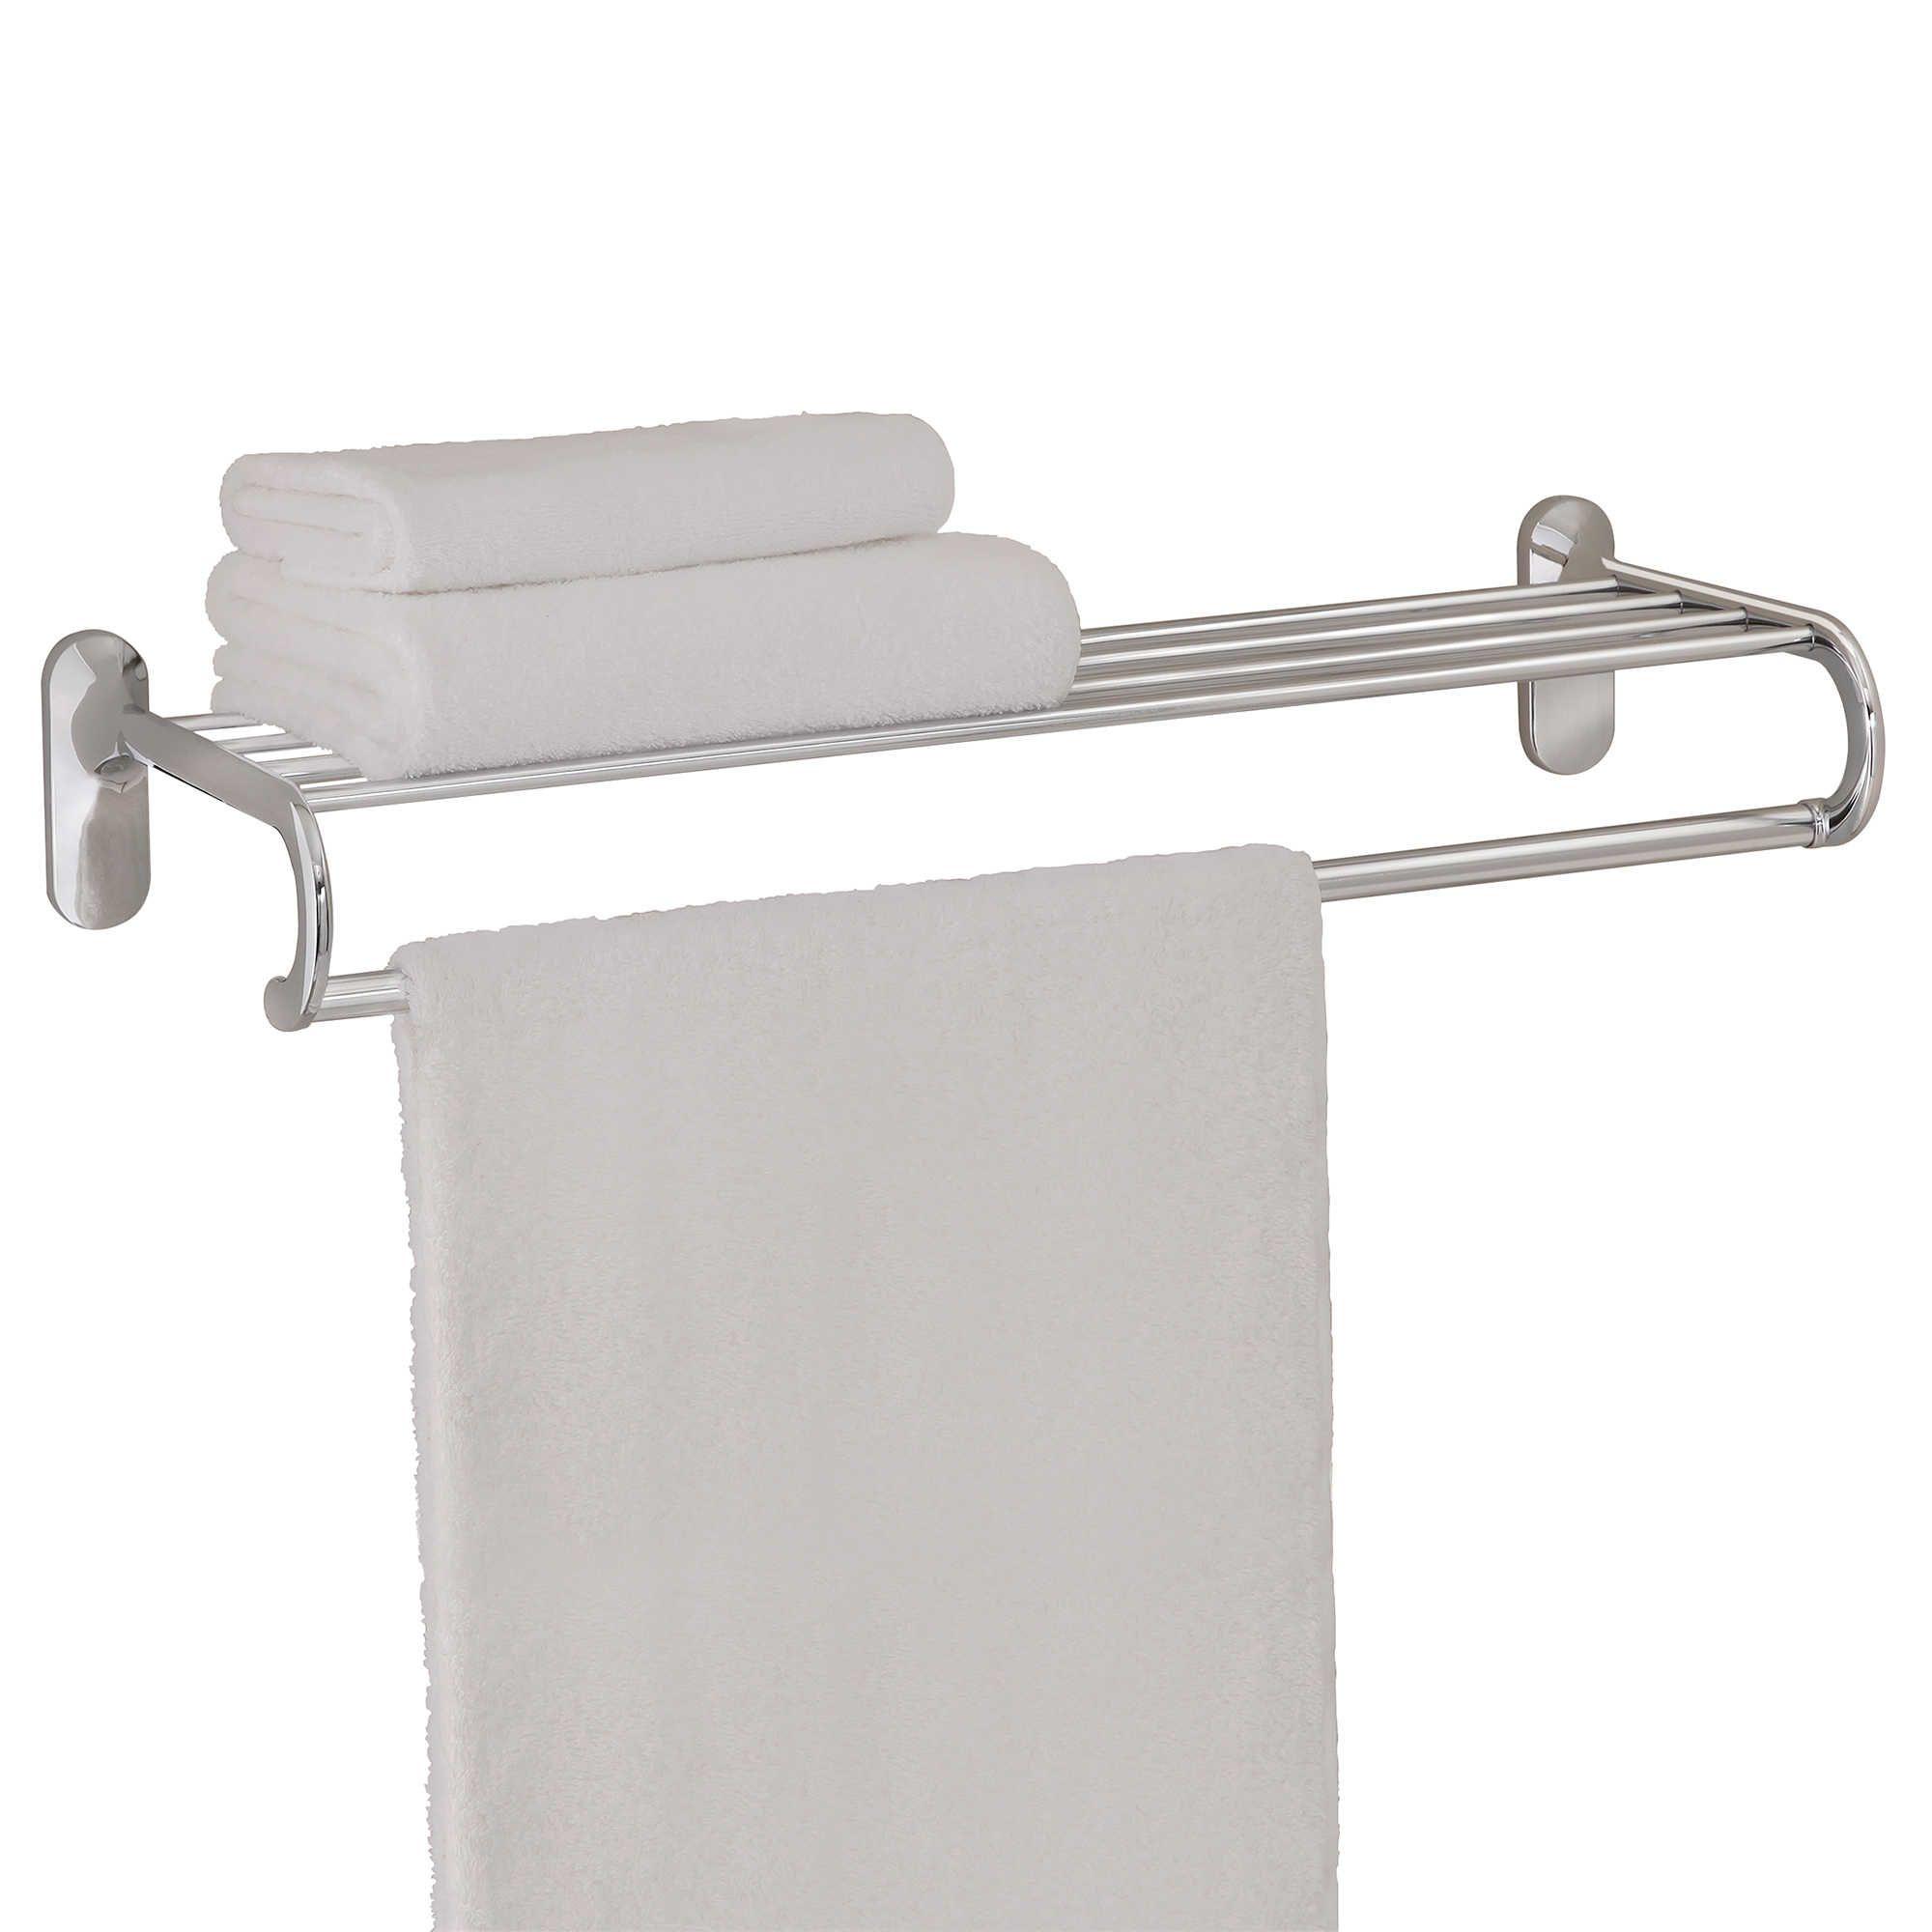 Taymor 24 Inch European Towel Shelf In Chrome Towel Shelf Bath Towel Racks Bath Furniture